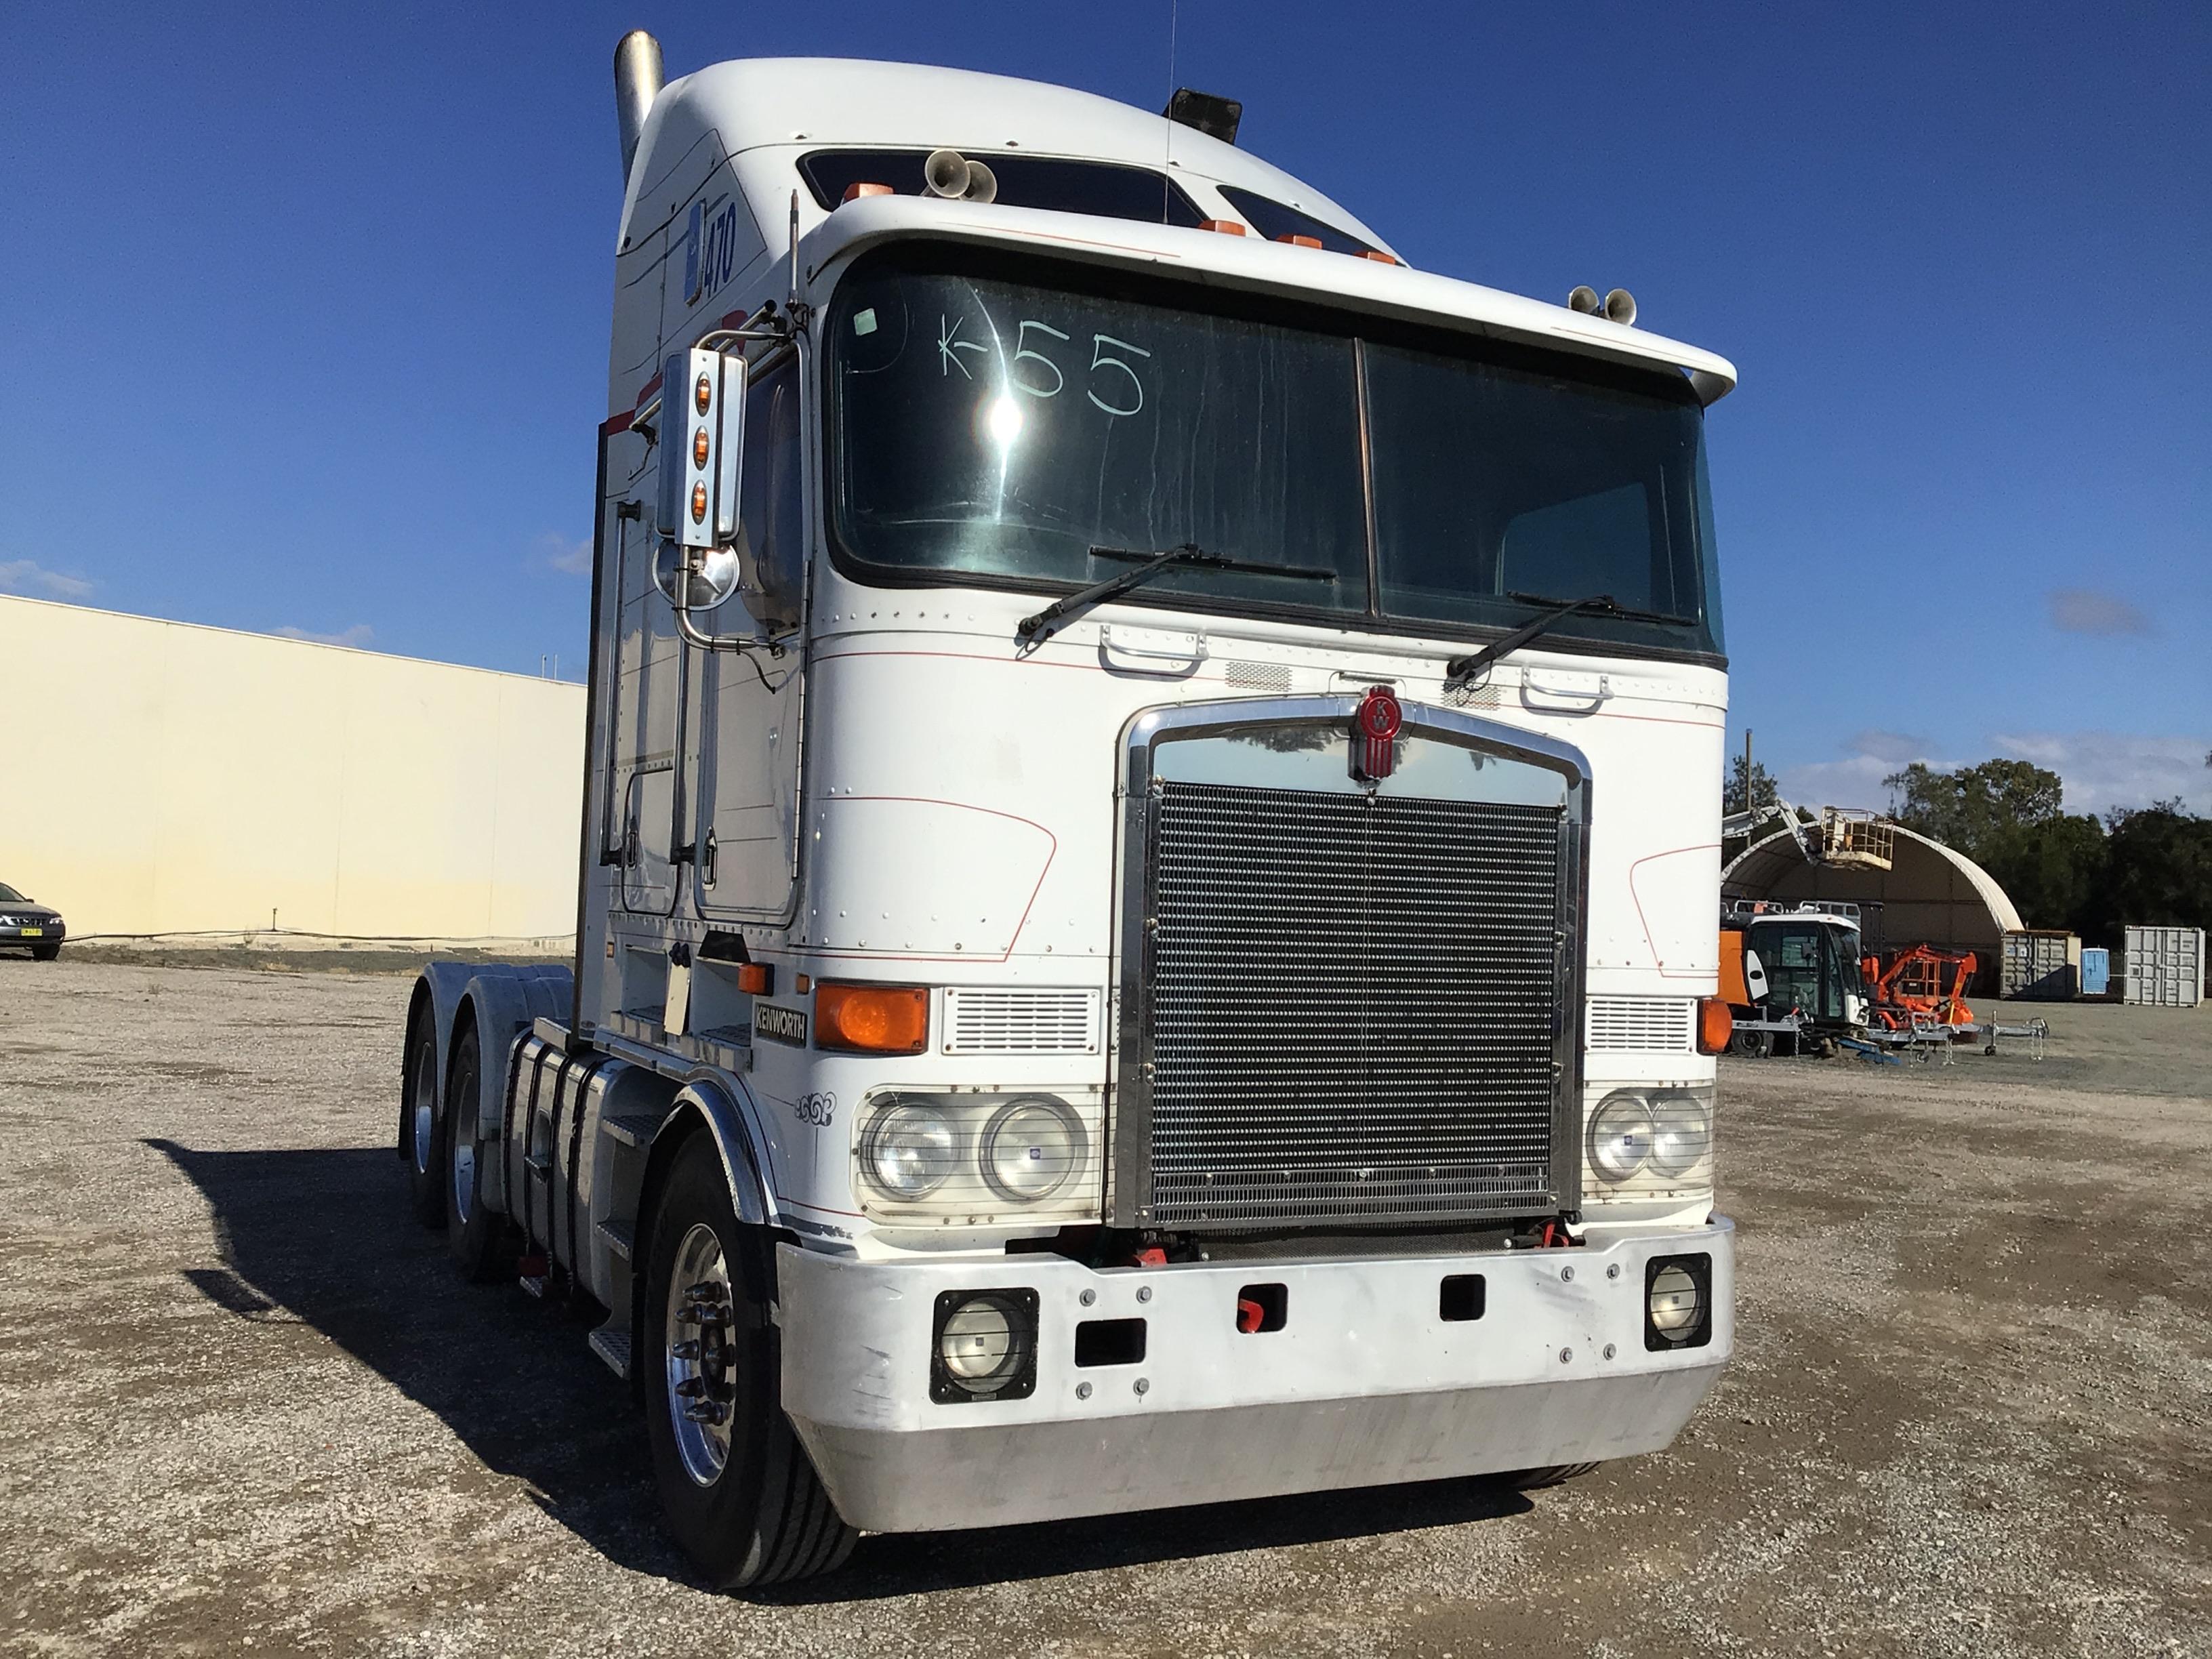 2009 Kenworth K108 6 x 4 Prime Mover Truck